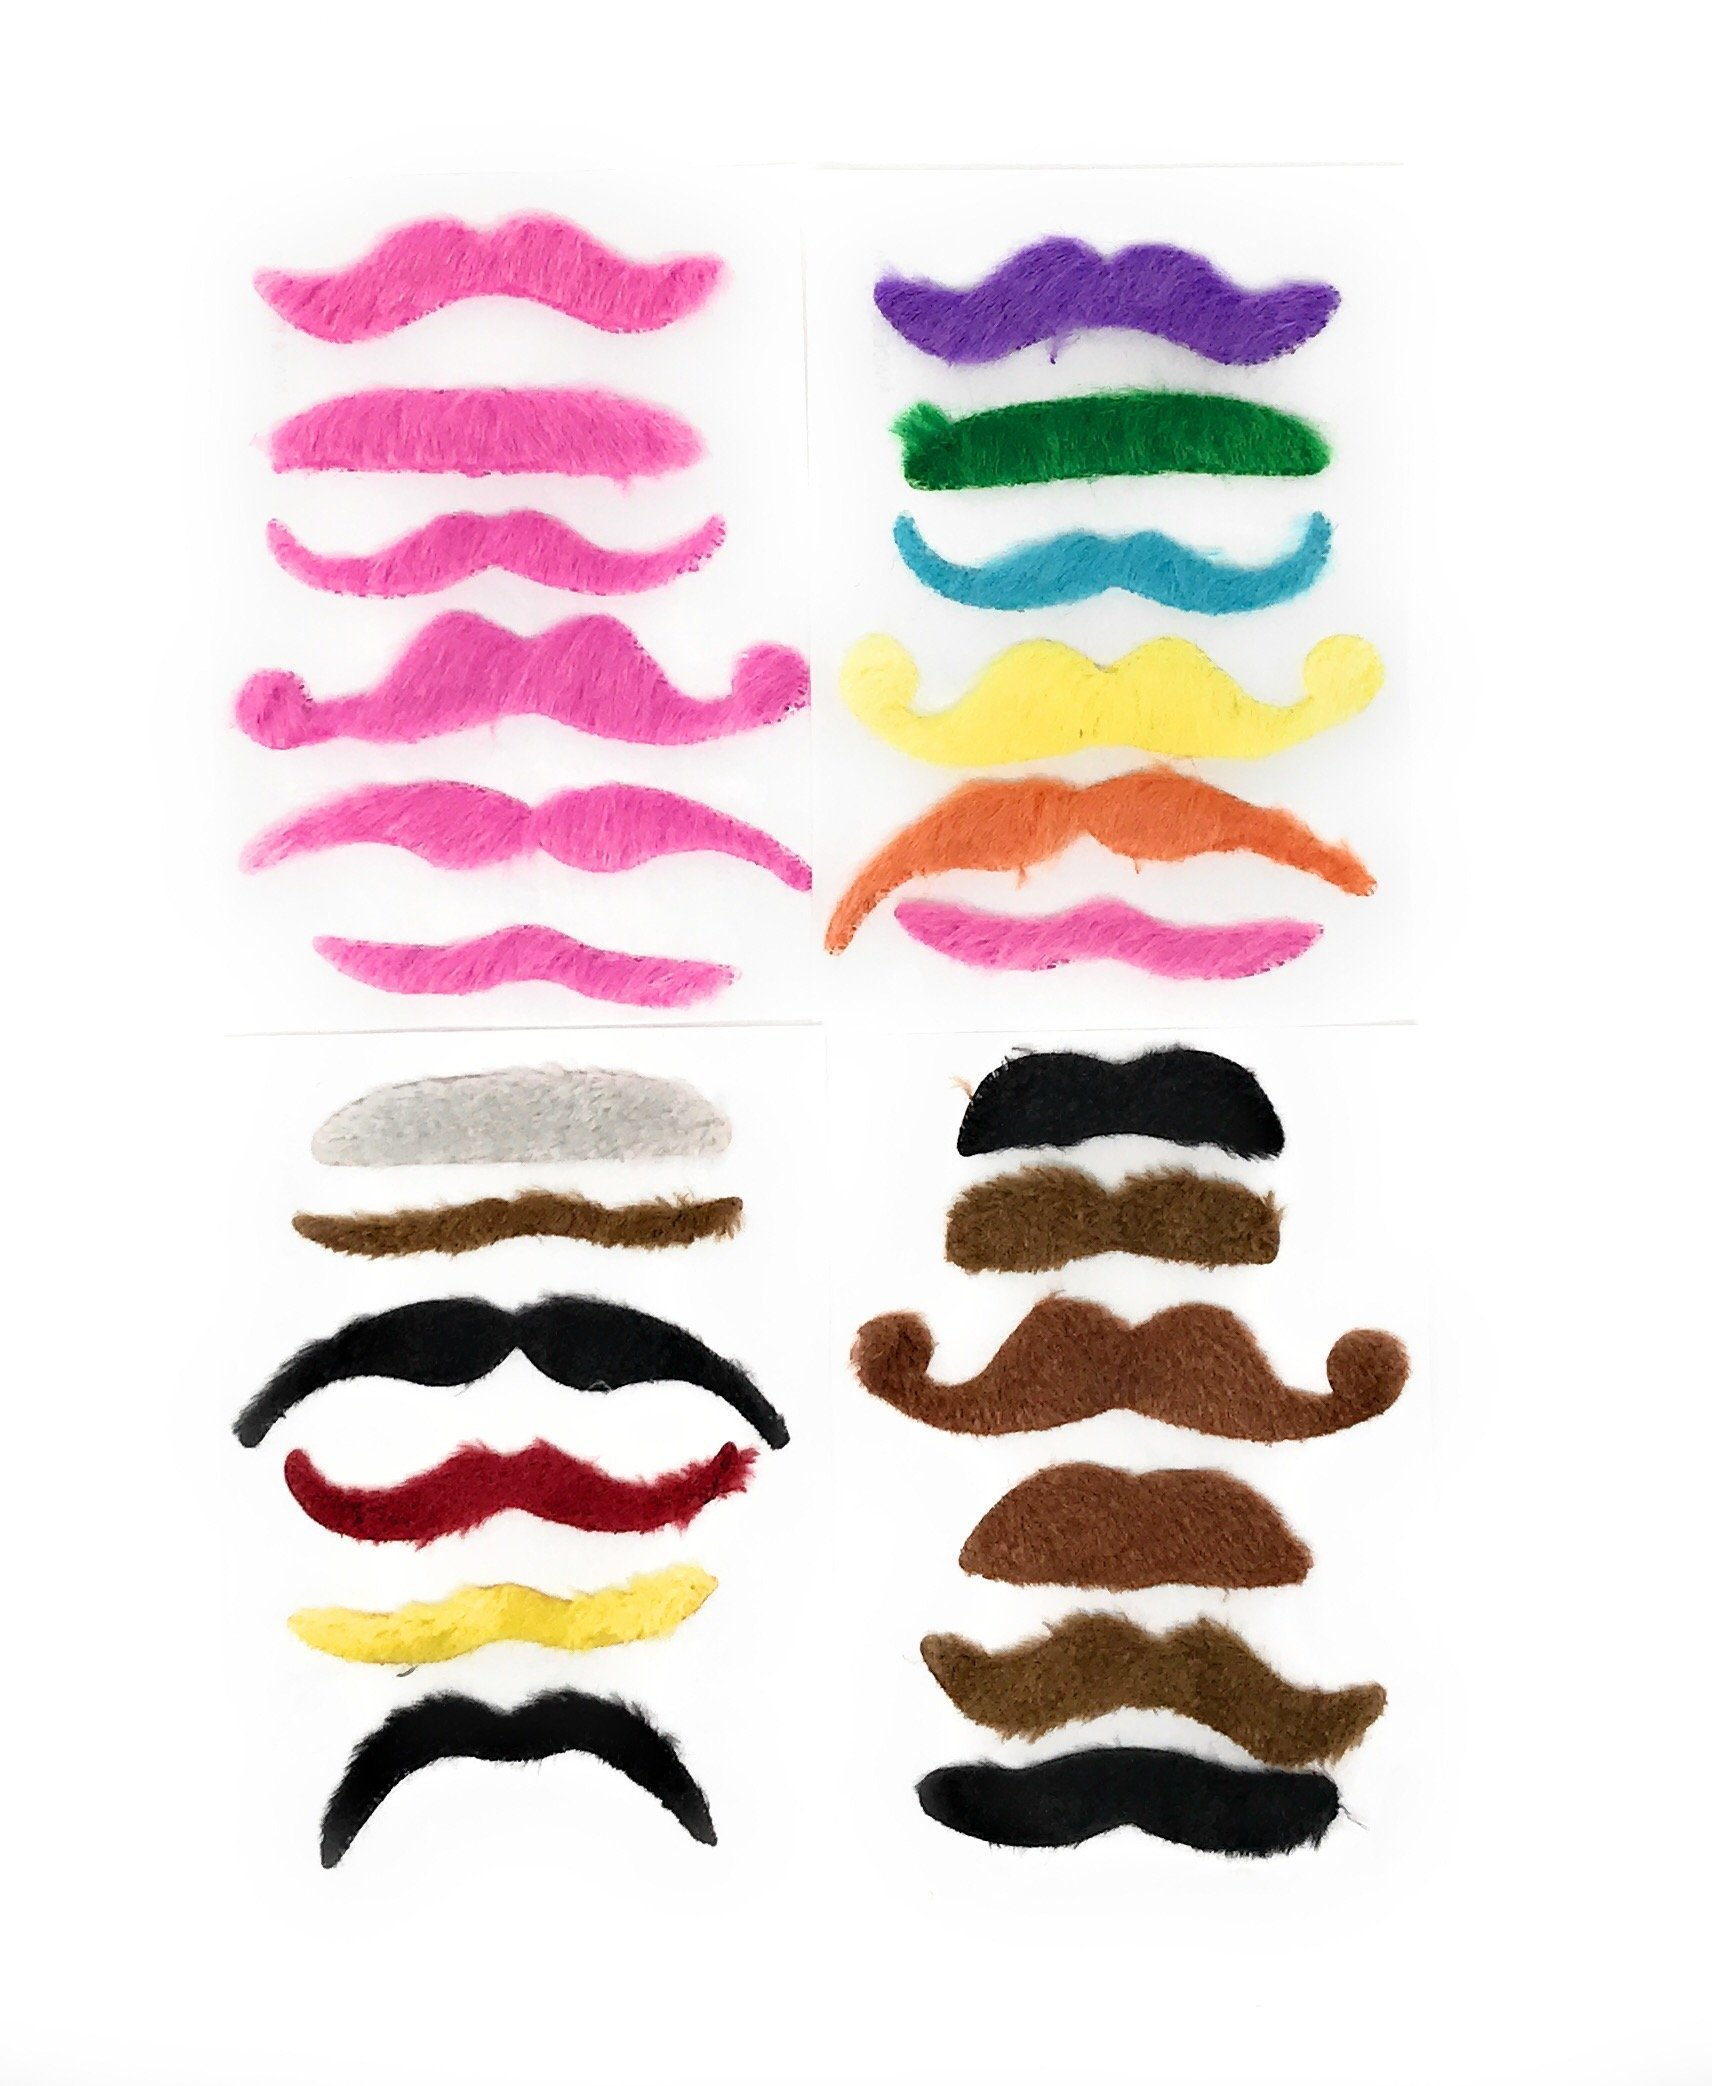 Sea View Treasures 36 Bulk Fake Costume Mustache Assortment (Pink, Brown, Black, Green, Blonde)